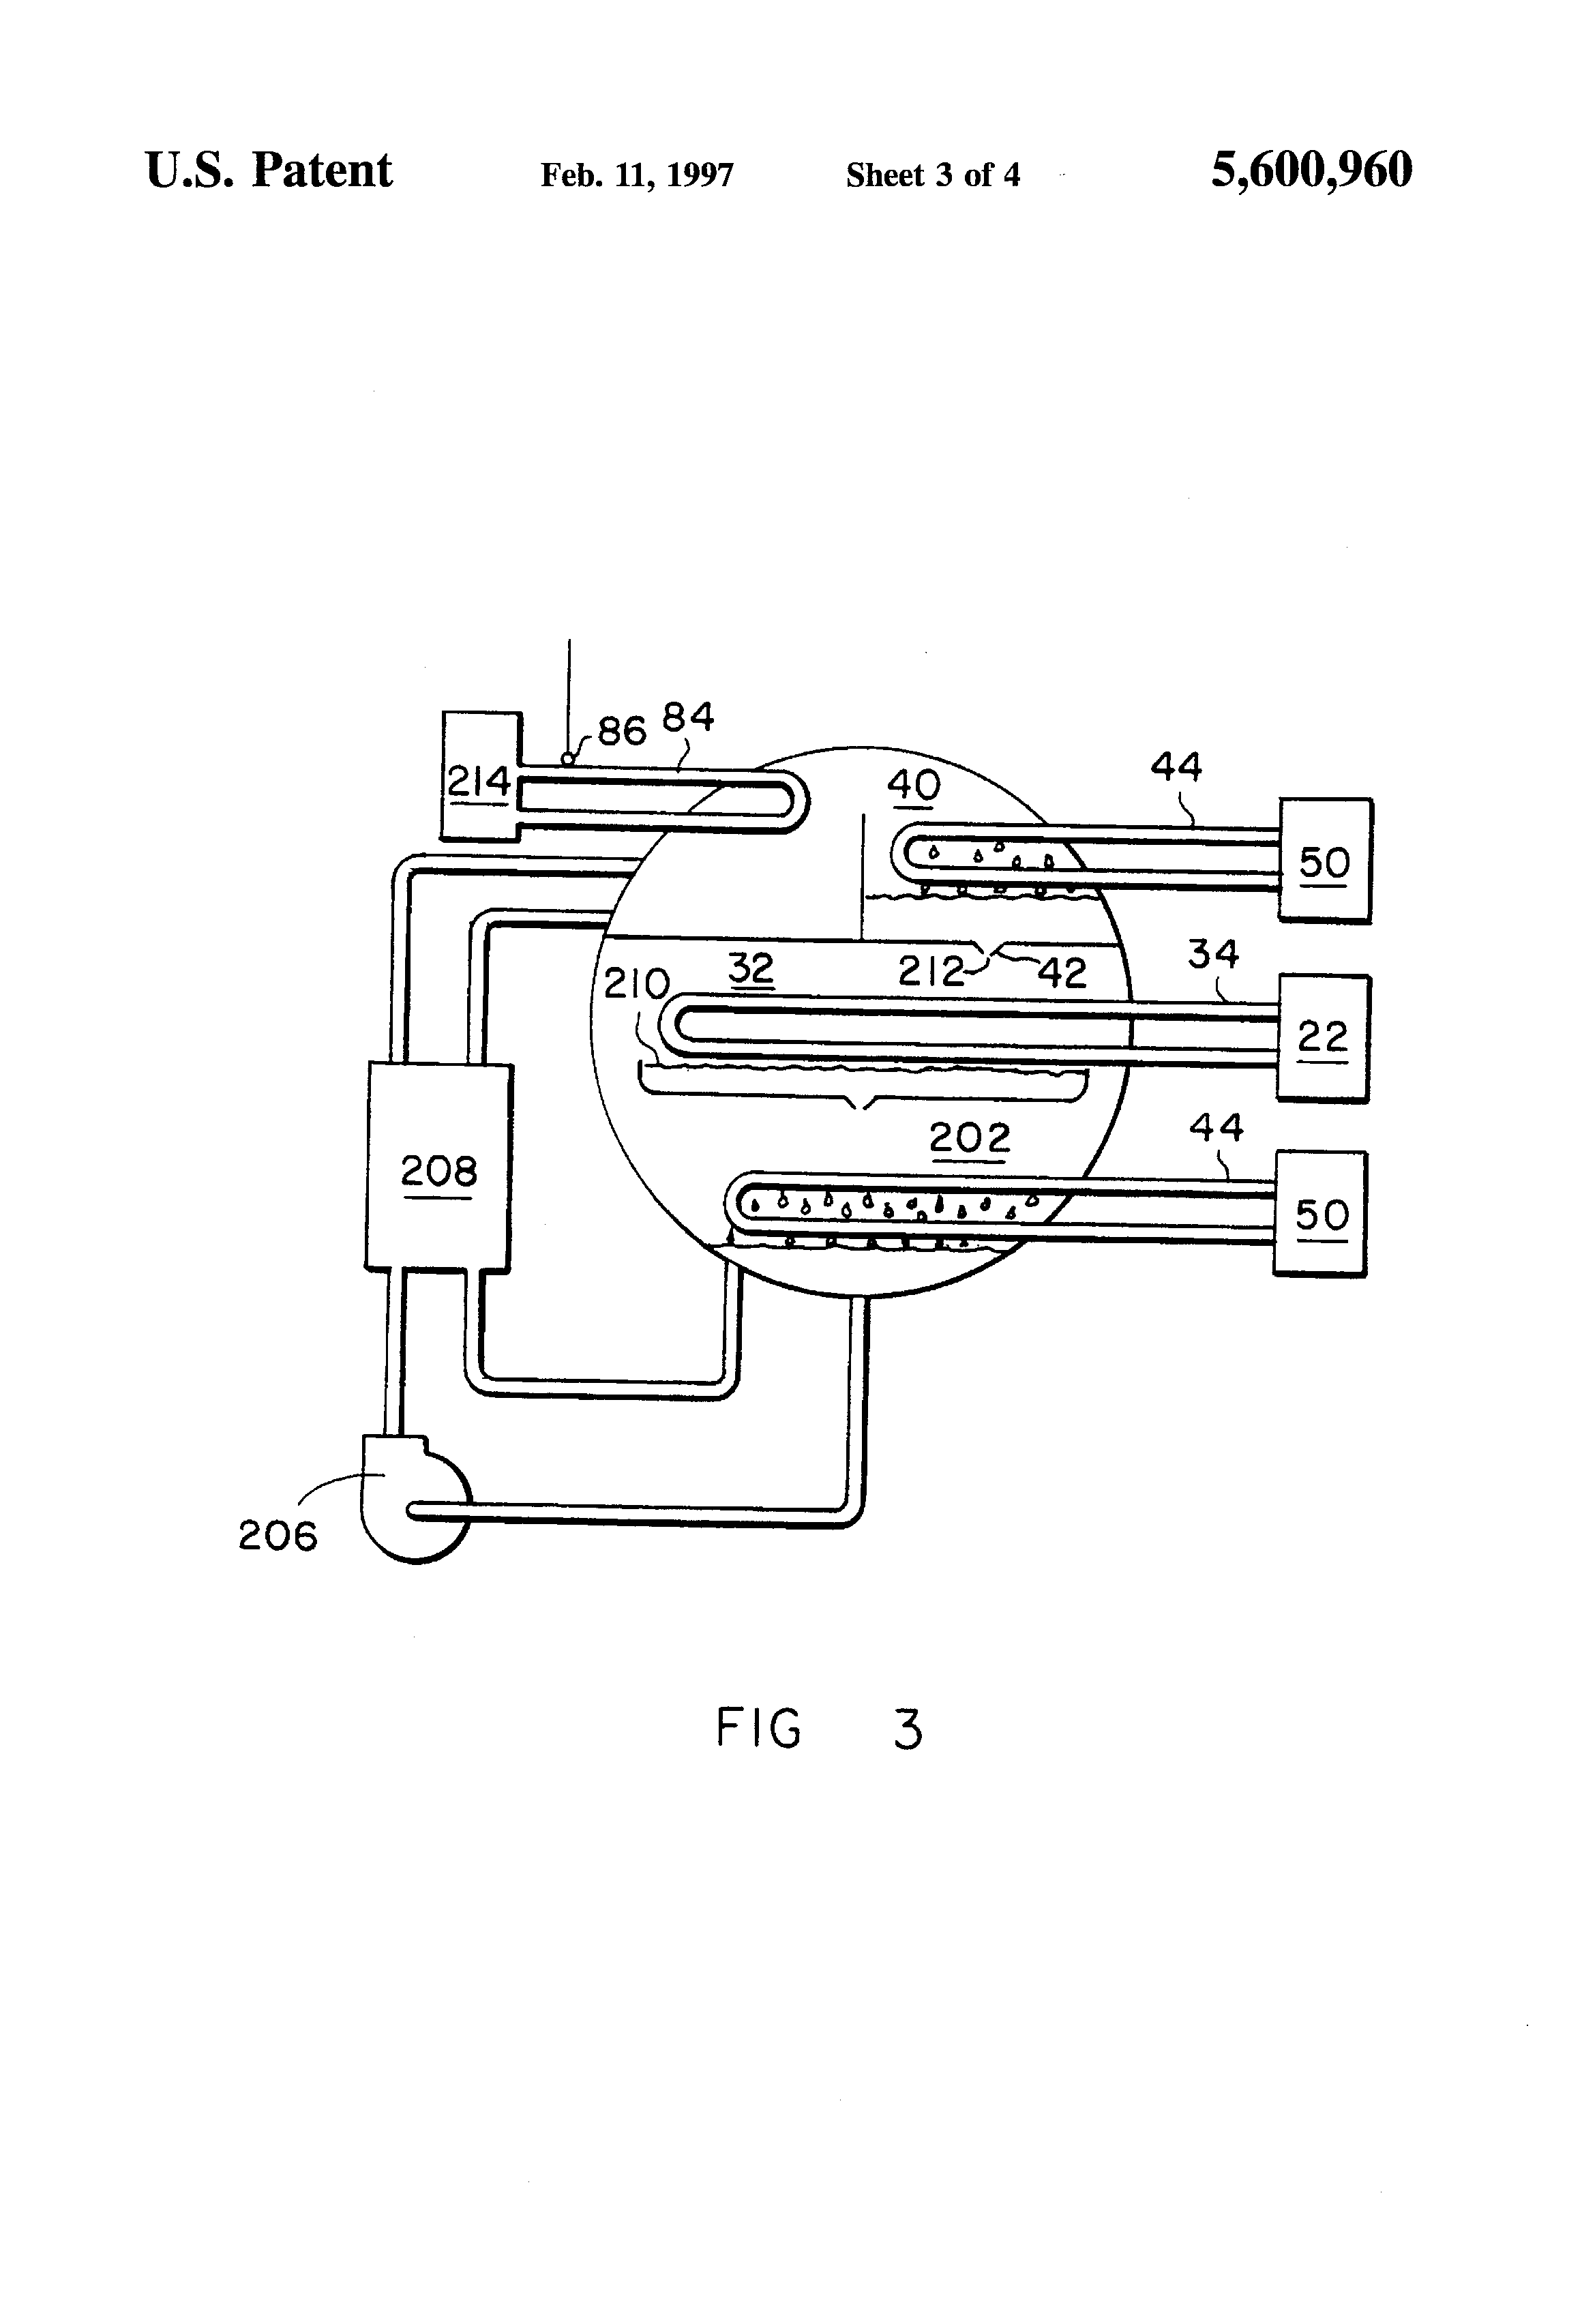 Near optimization of cooling tower condenser water   Patents #3E3E3E